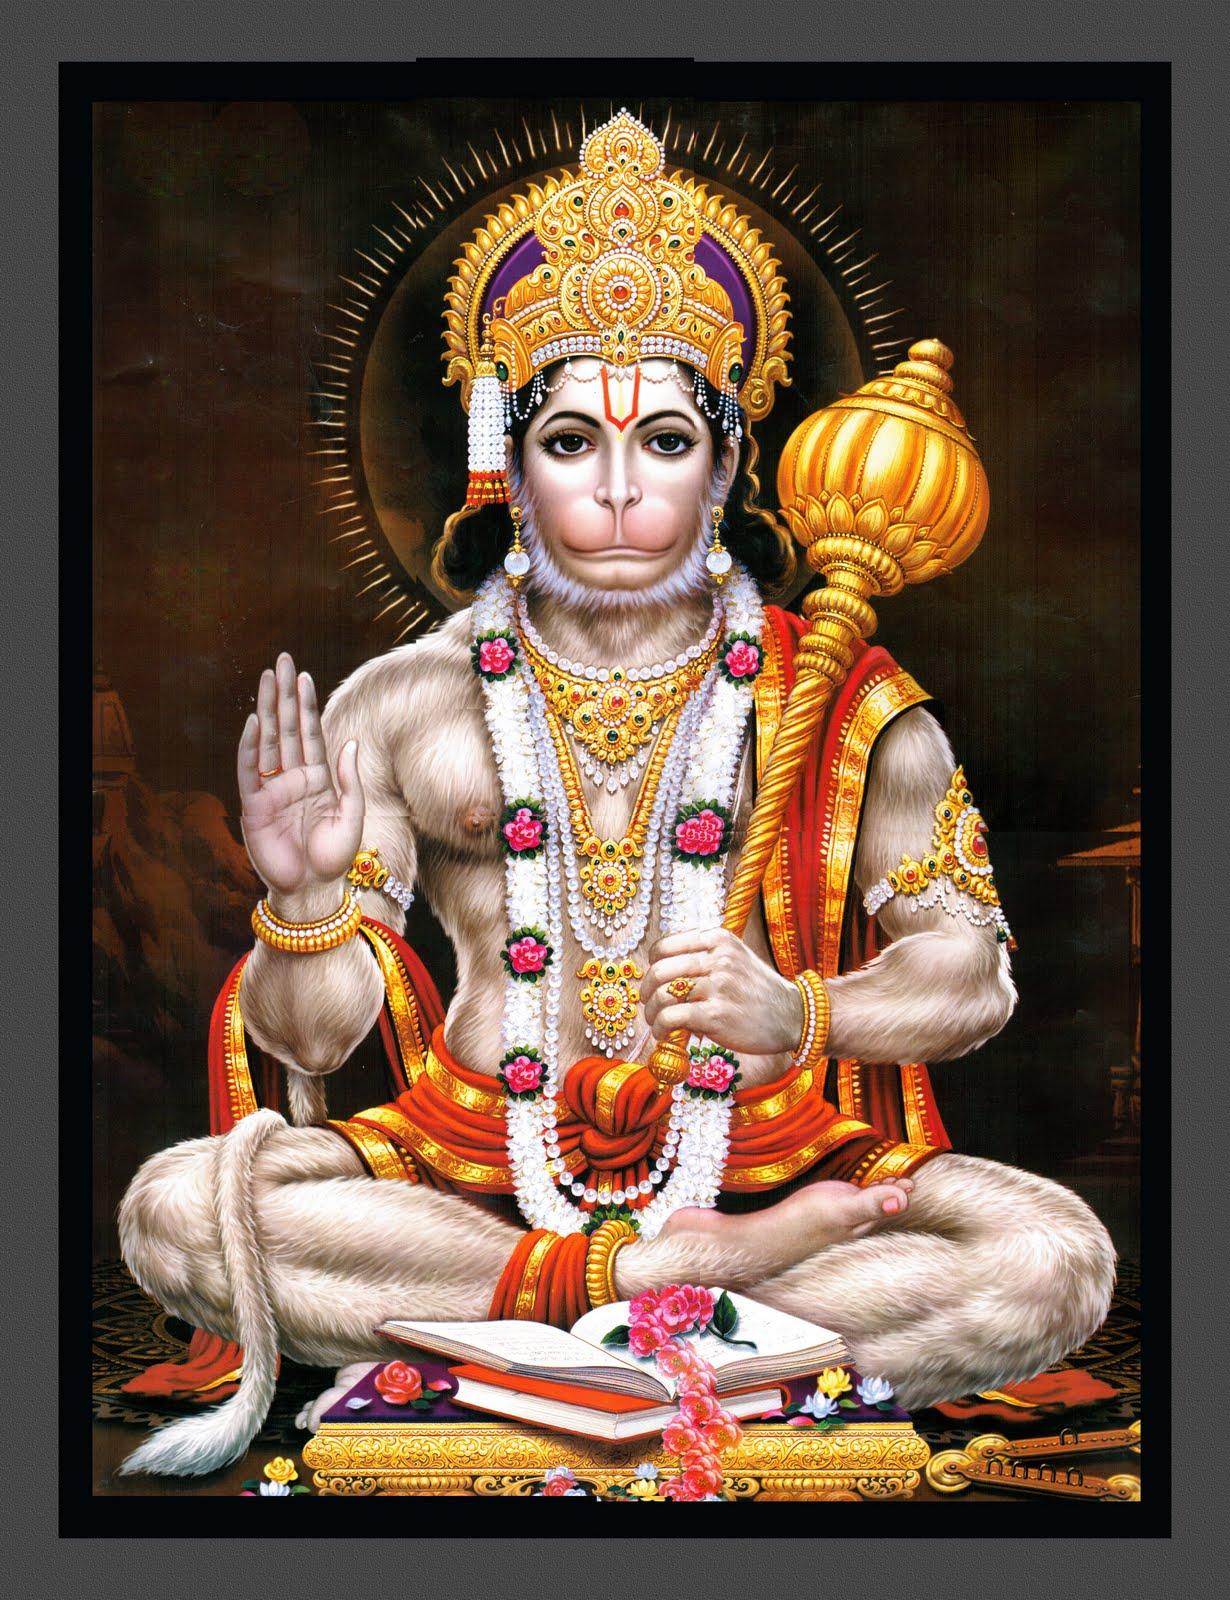 http://3.bp.blogspot.com/_99iEgS43mhk/S6x_2VSHYDI/AAAAAAAABKE/EqV5ppZgIOU/s1600/Hanuman+Ji1.jpg